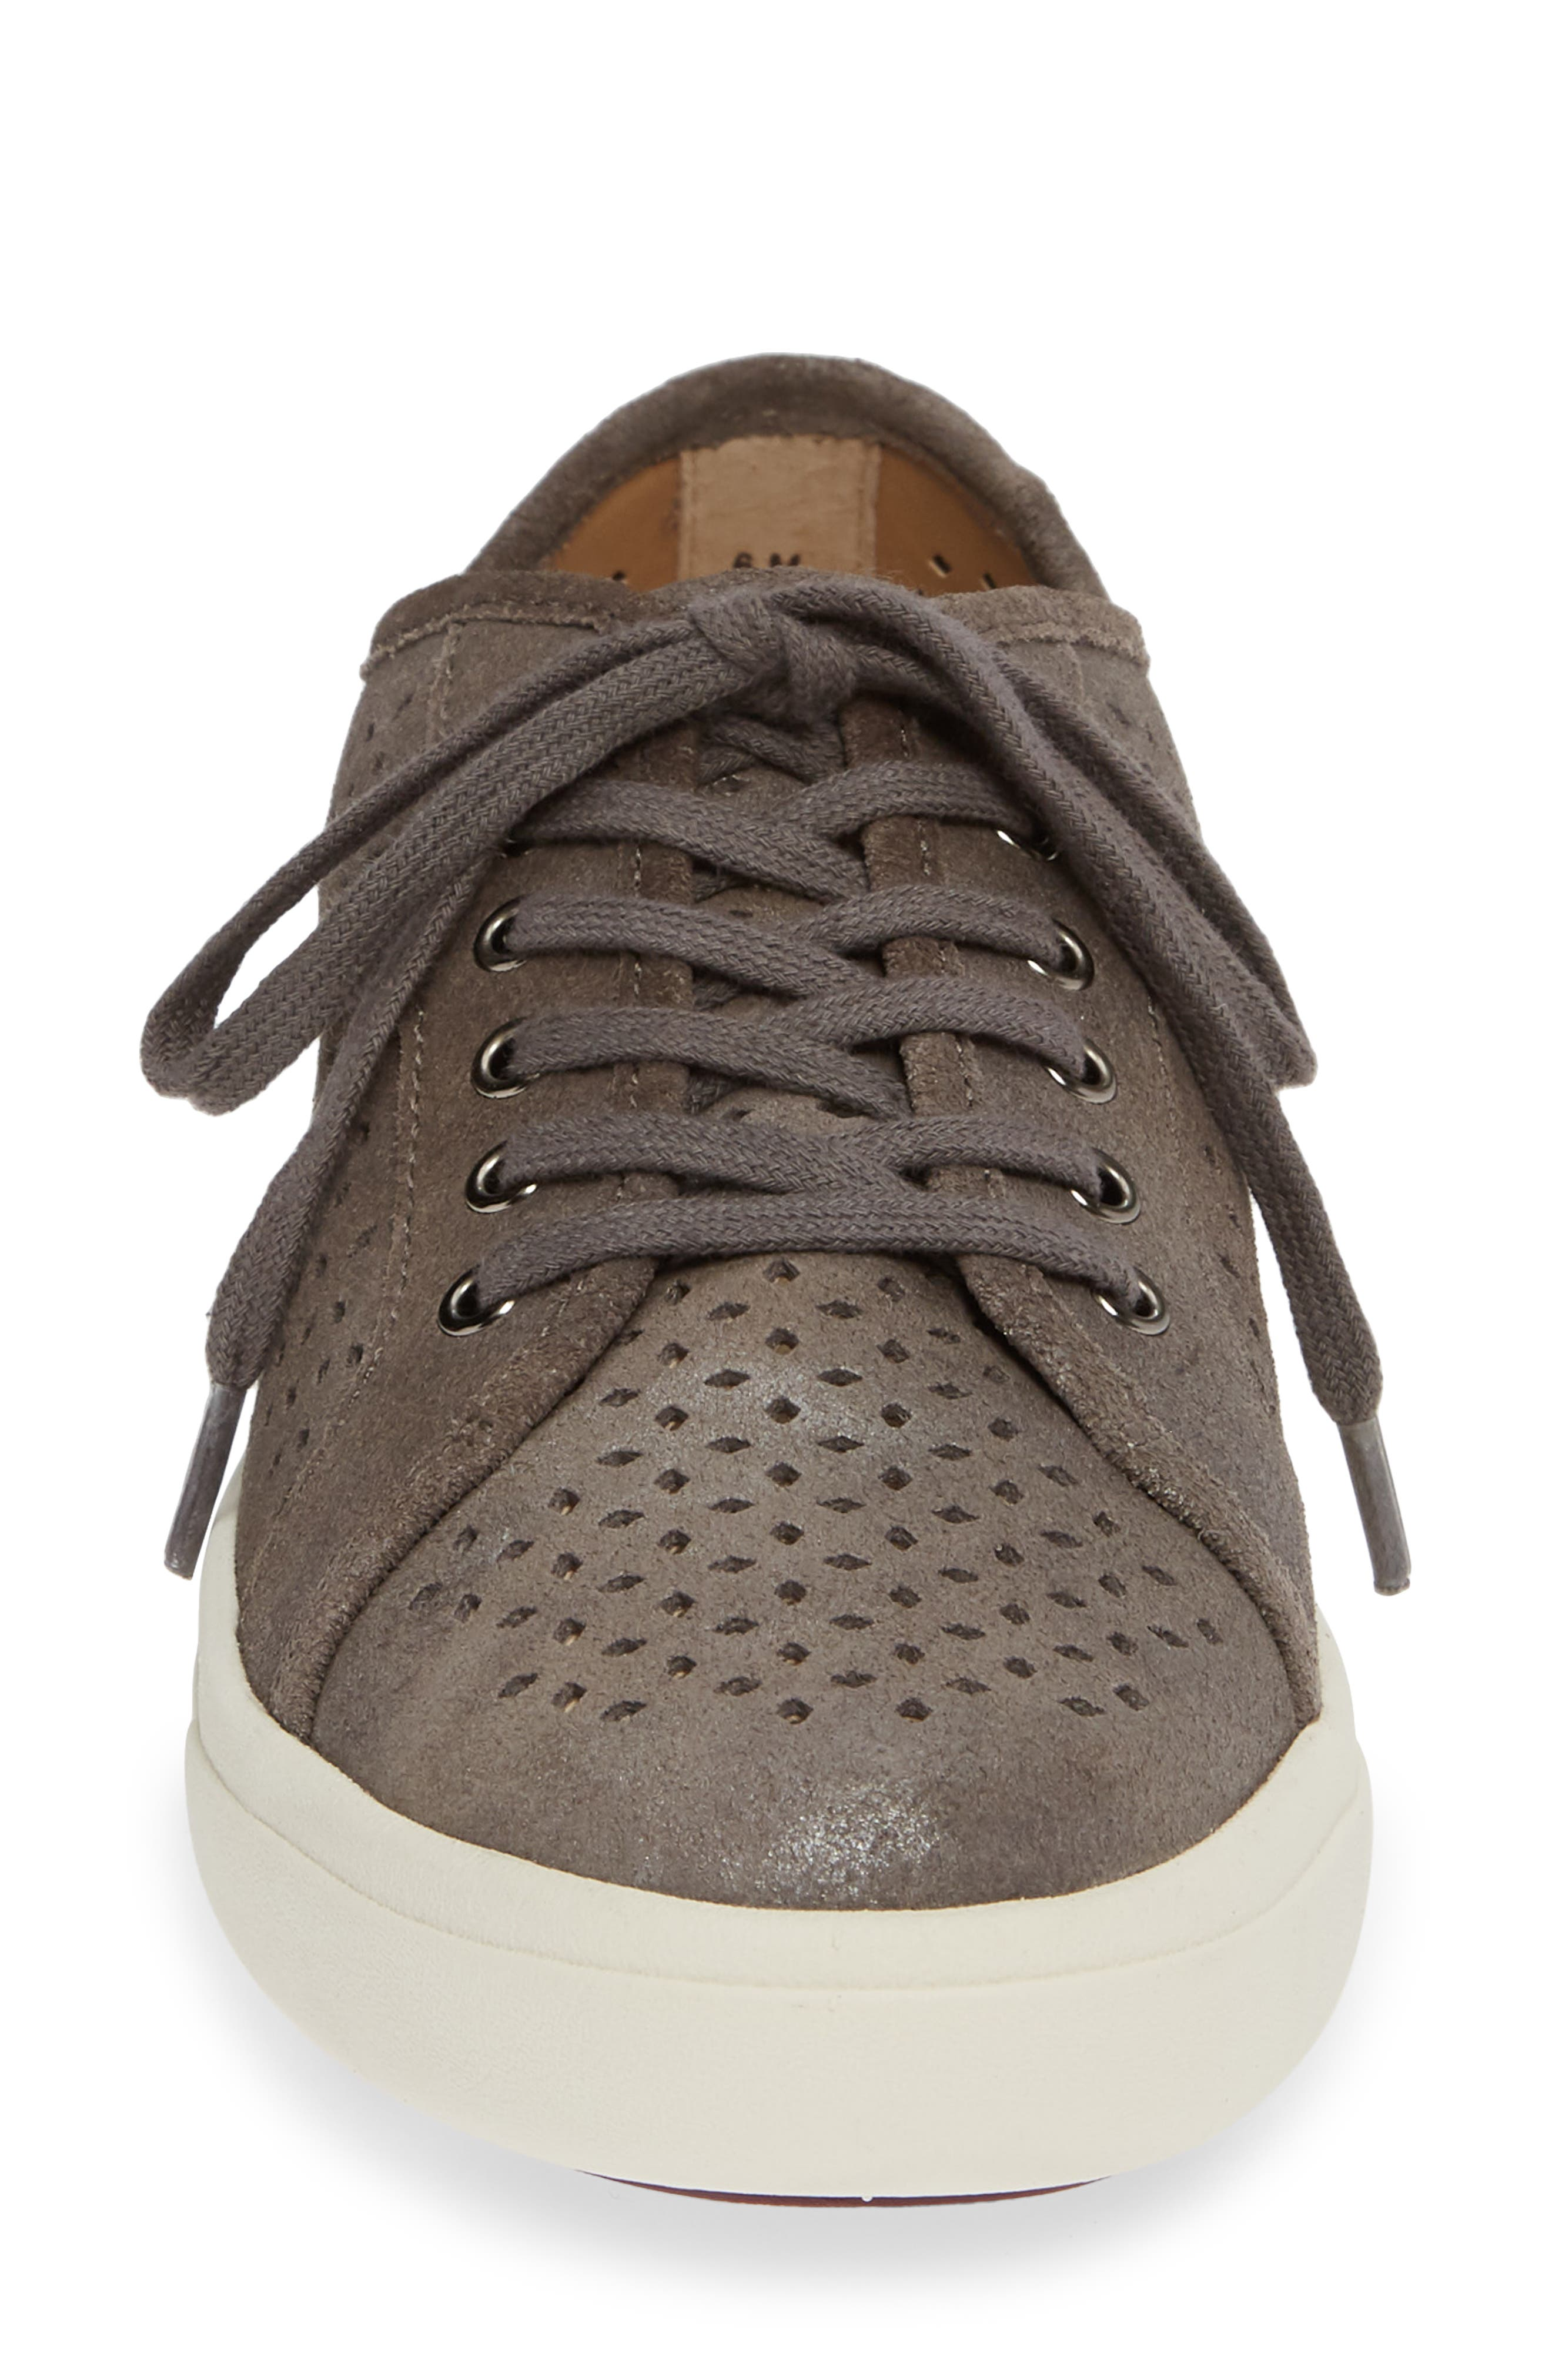 Oneida Sneaker,                             Alternate thumbnail 4, color,                             GREY SUEDE